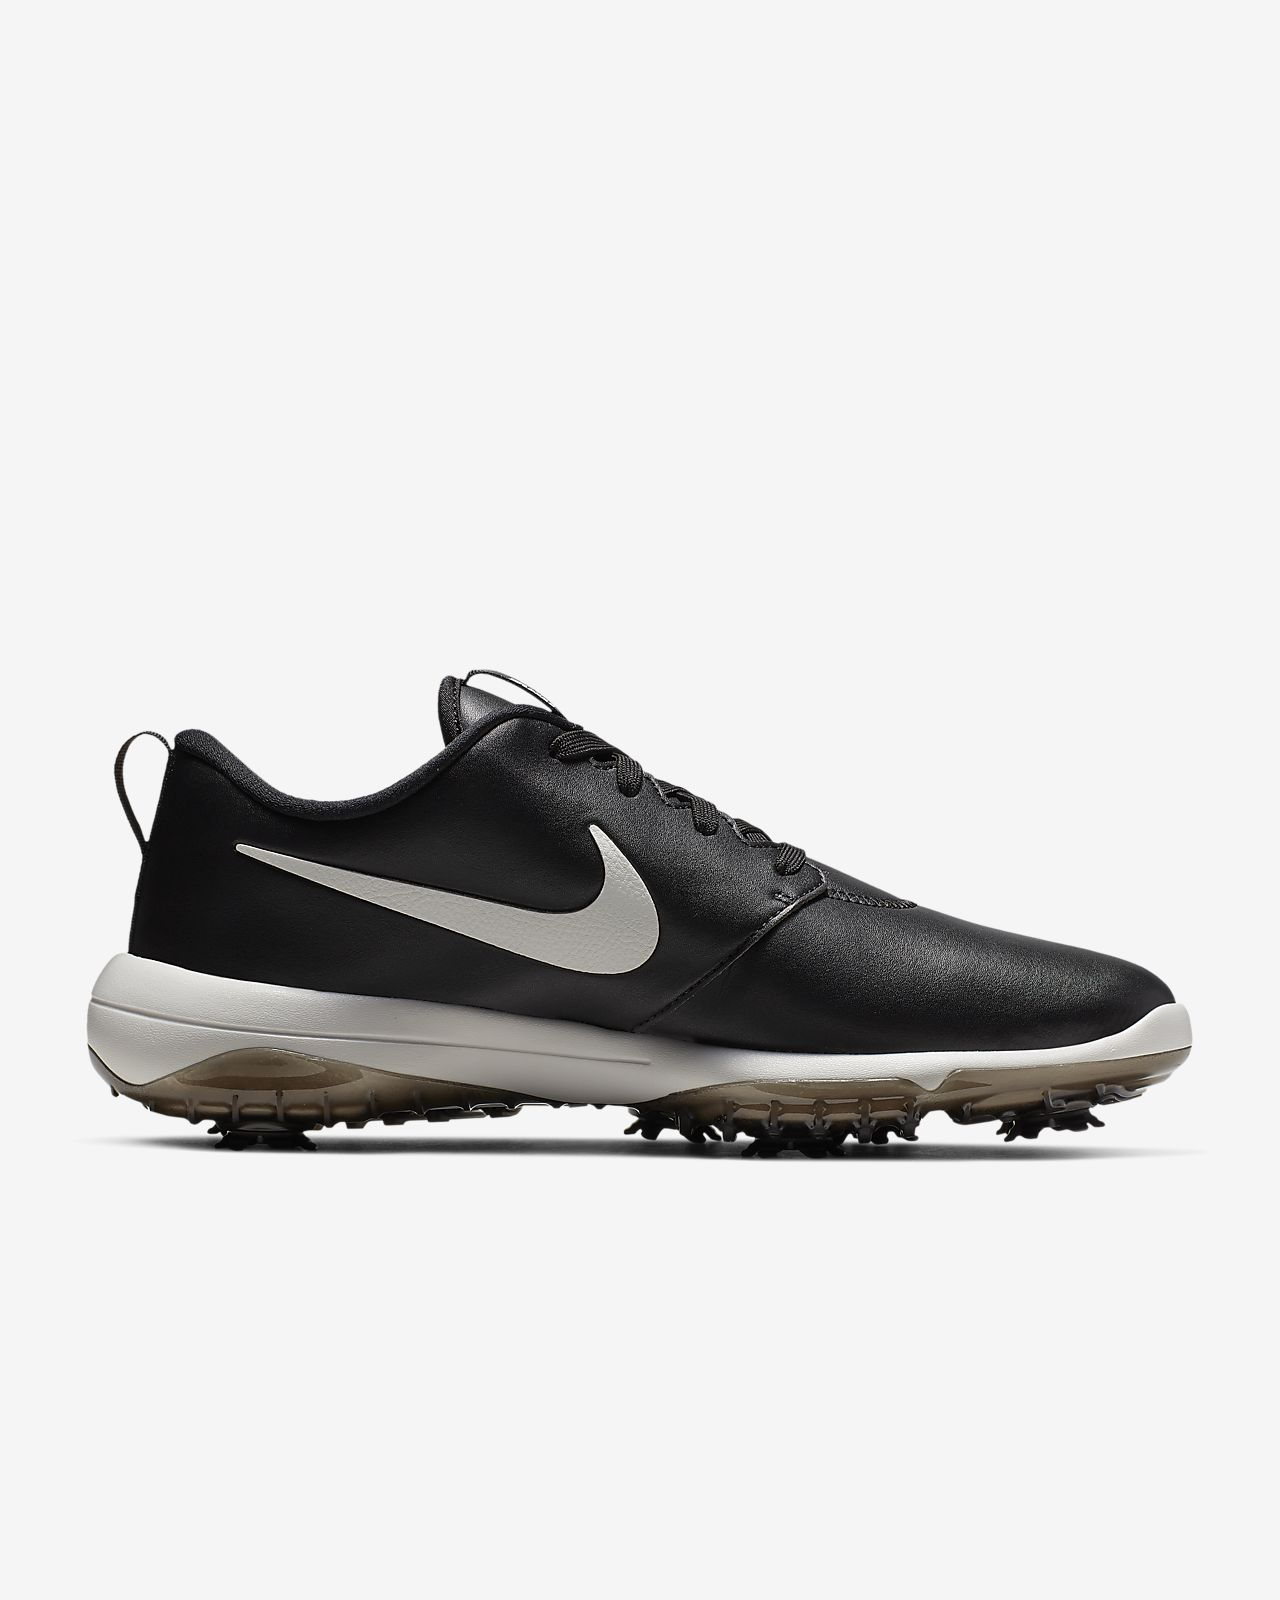 8b6f913d290e Nike Roshe G Tour Men s Golf Shoe. Nike.com GB